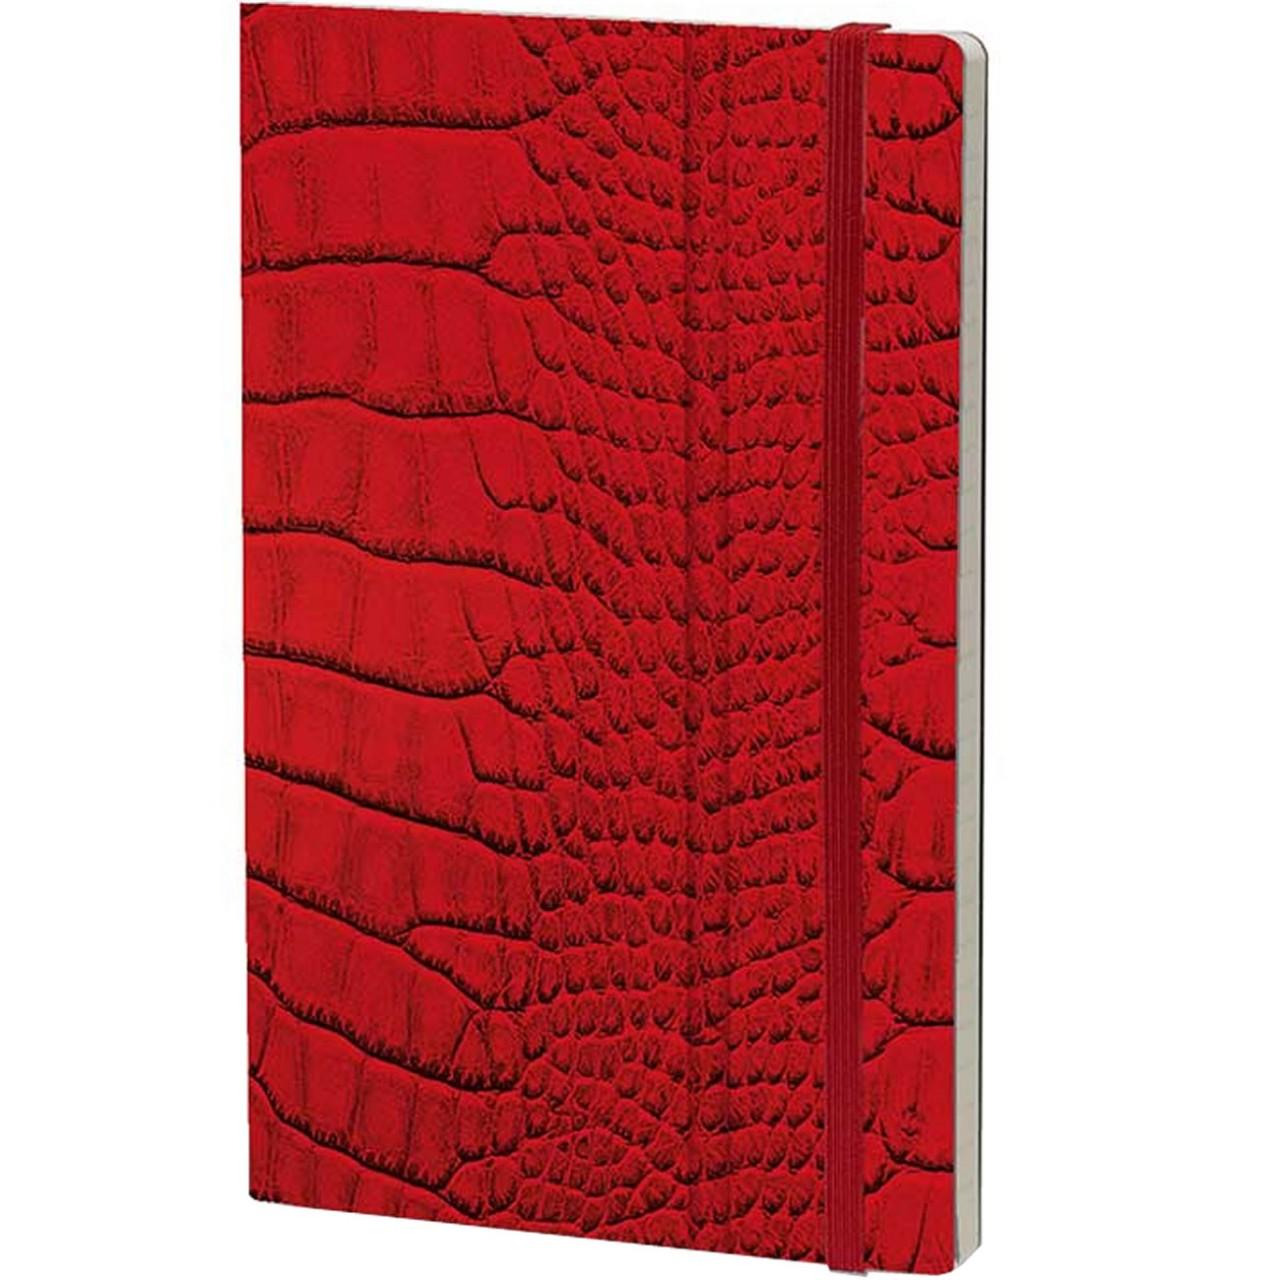 Stifflexible Notizbuch MRS CROCODILE 13 x 21 cm 192 S., RED